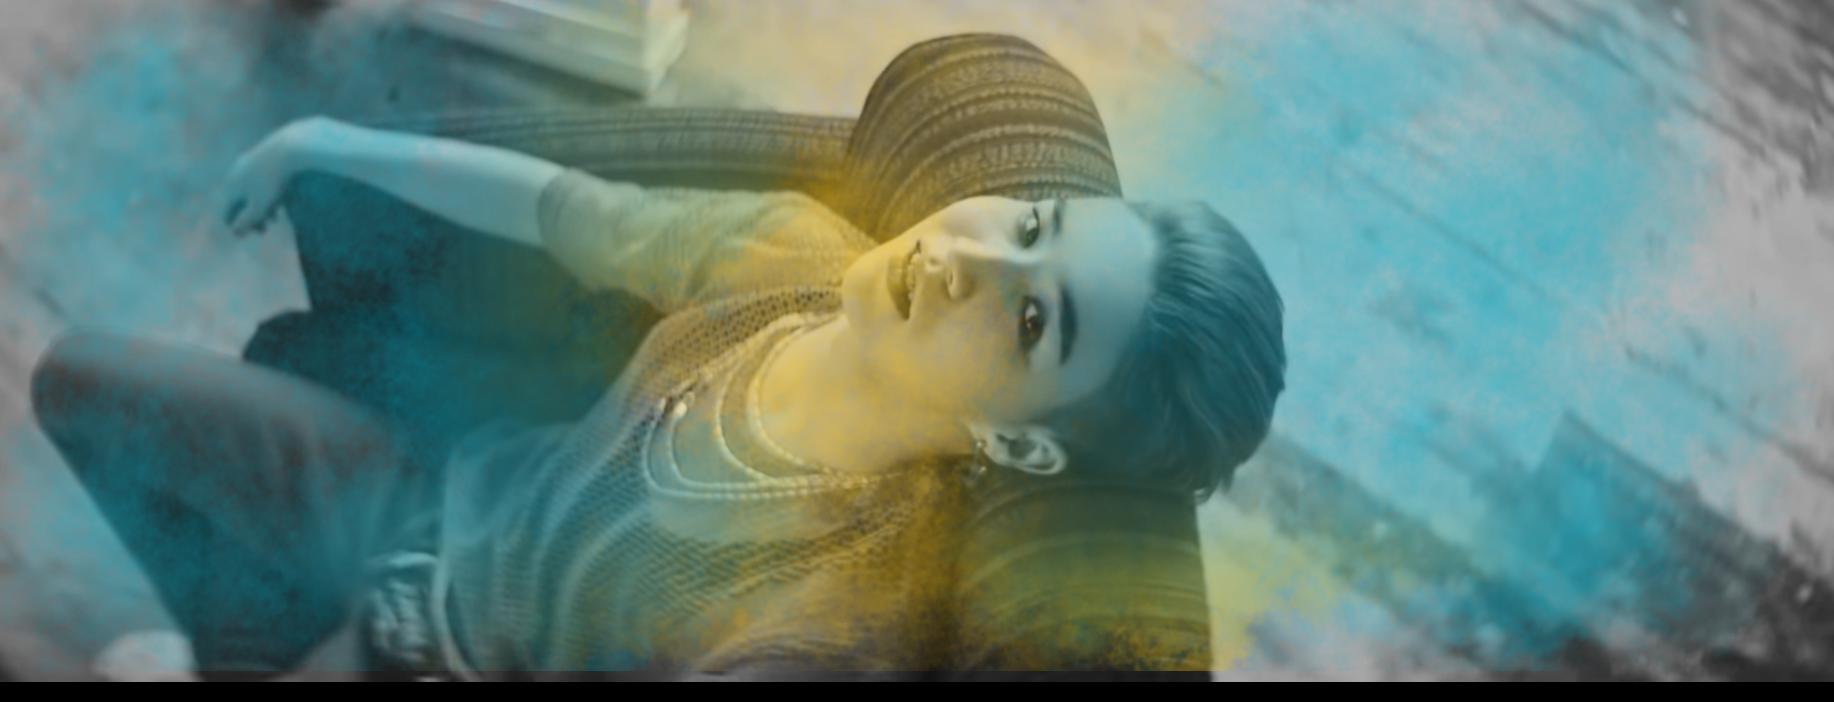 "Image of Bala from ""Bayau"" video"